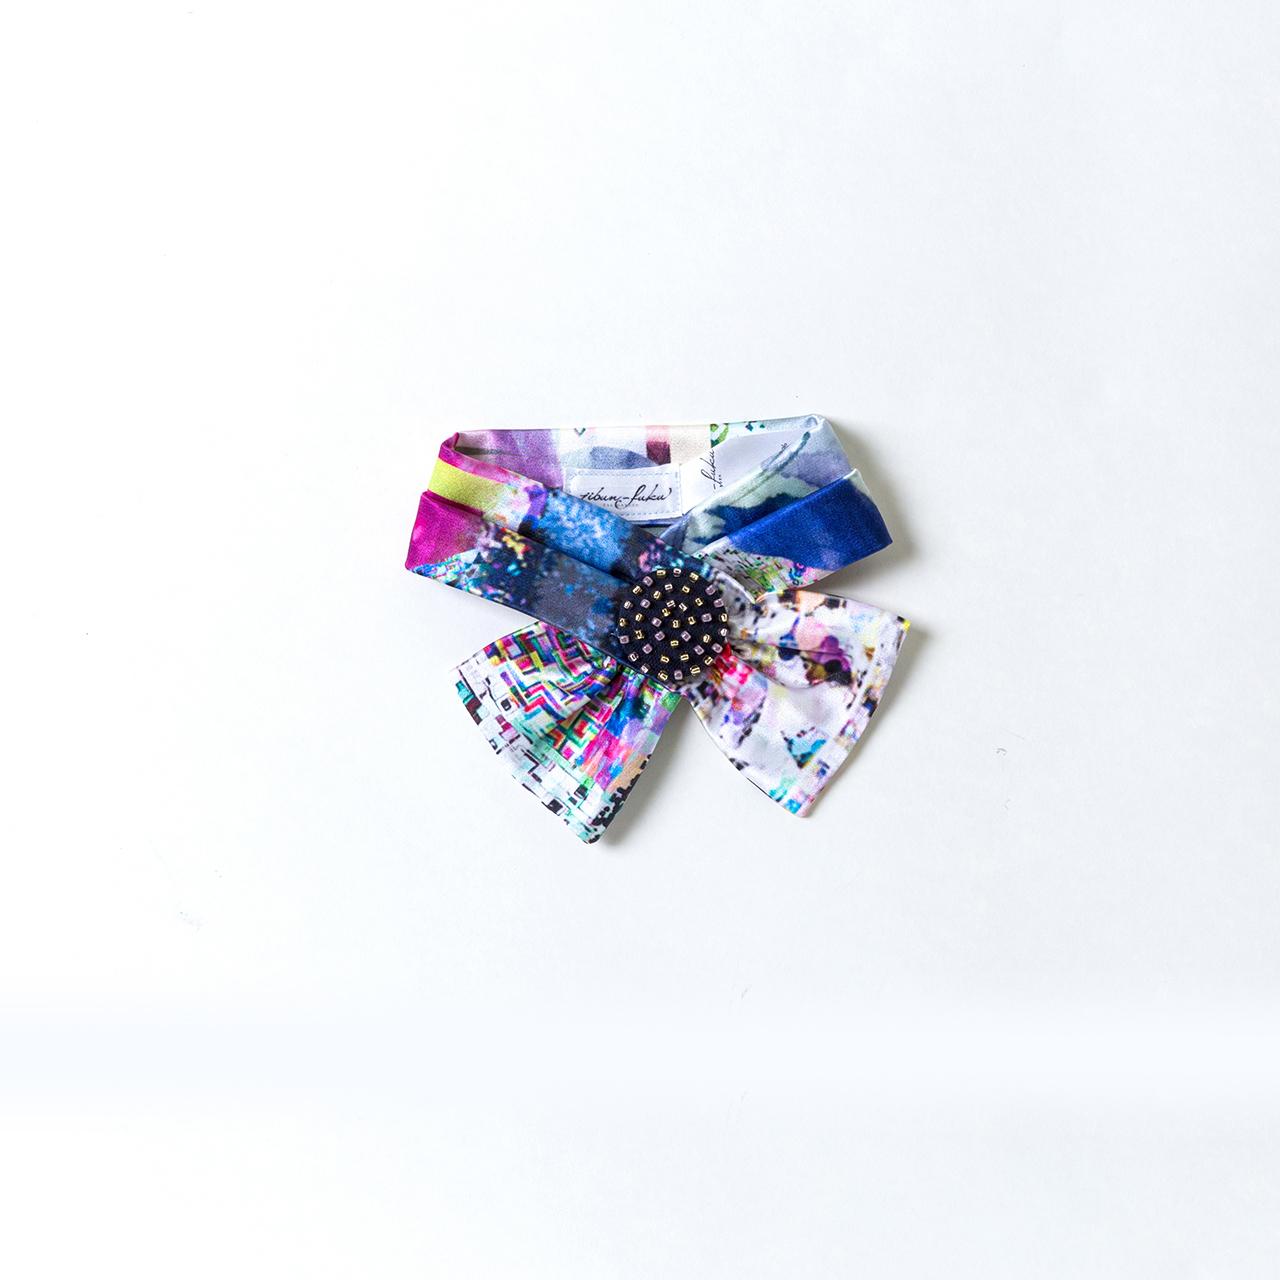 jibun-fuku DOG 【リボンカラーbeads】DOGRB201863